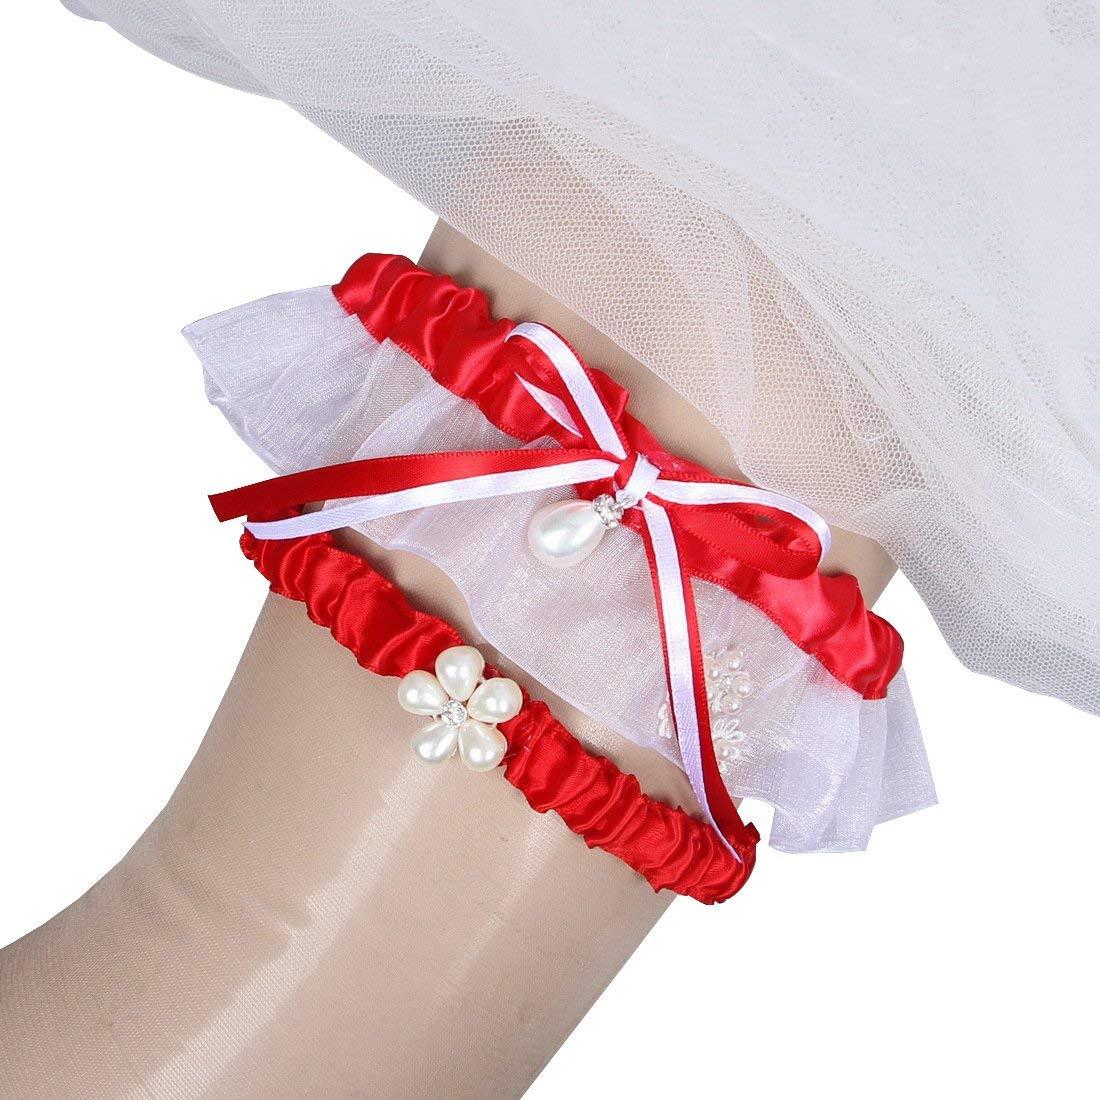 7aa9cbebb00 Get Quotations · MerryJuly Bridal Garter set Wedding Garters Red Prom Garter  2017